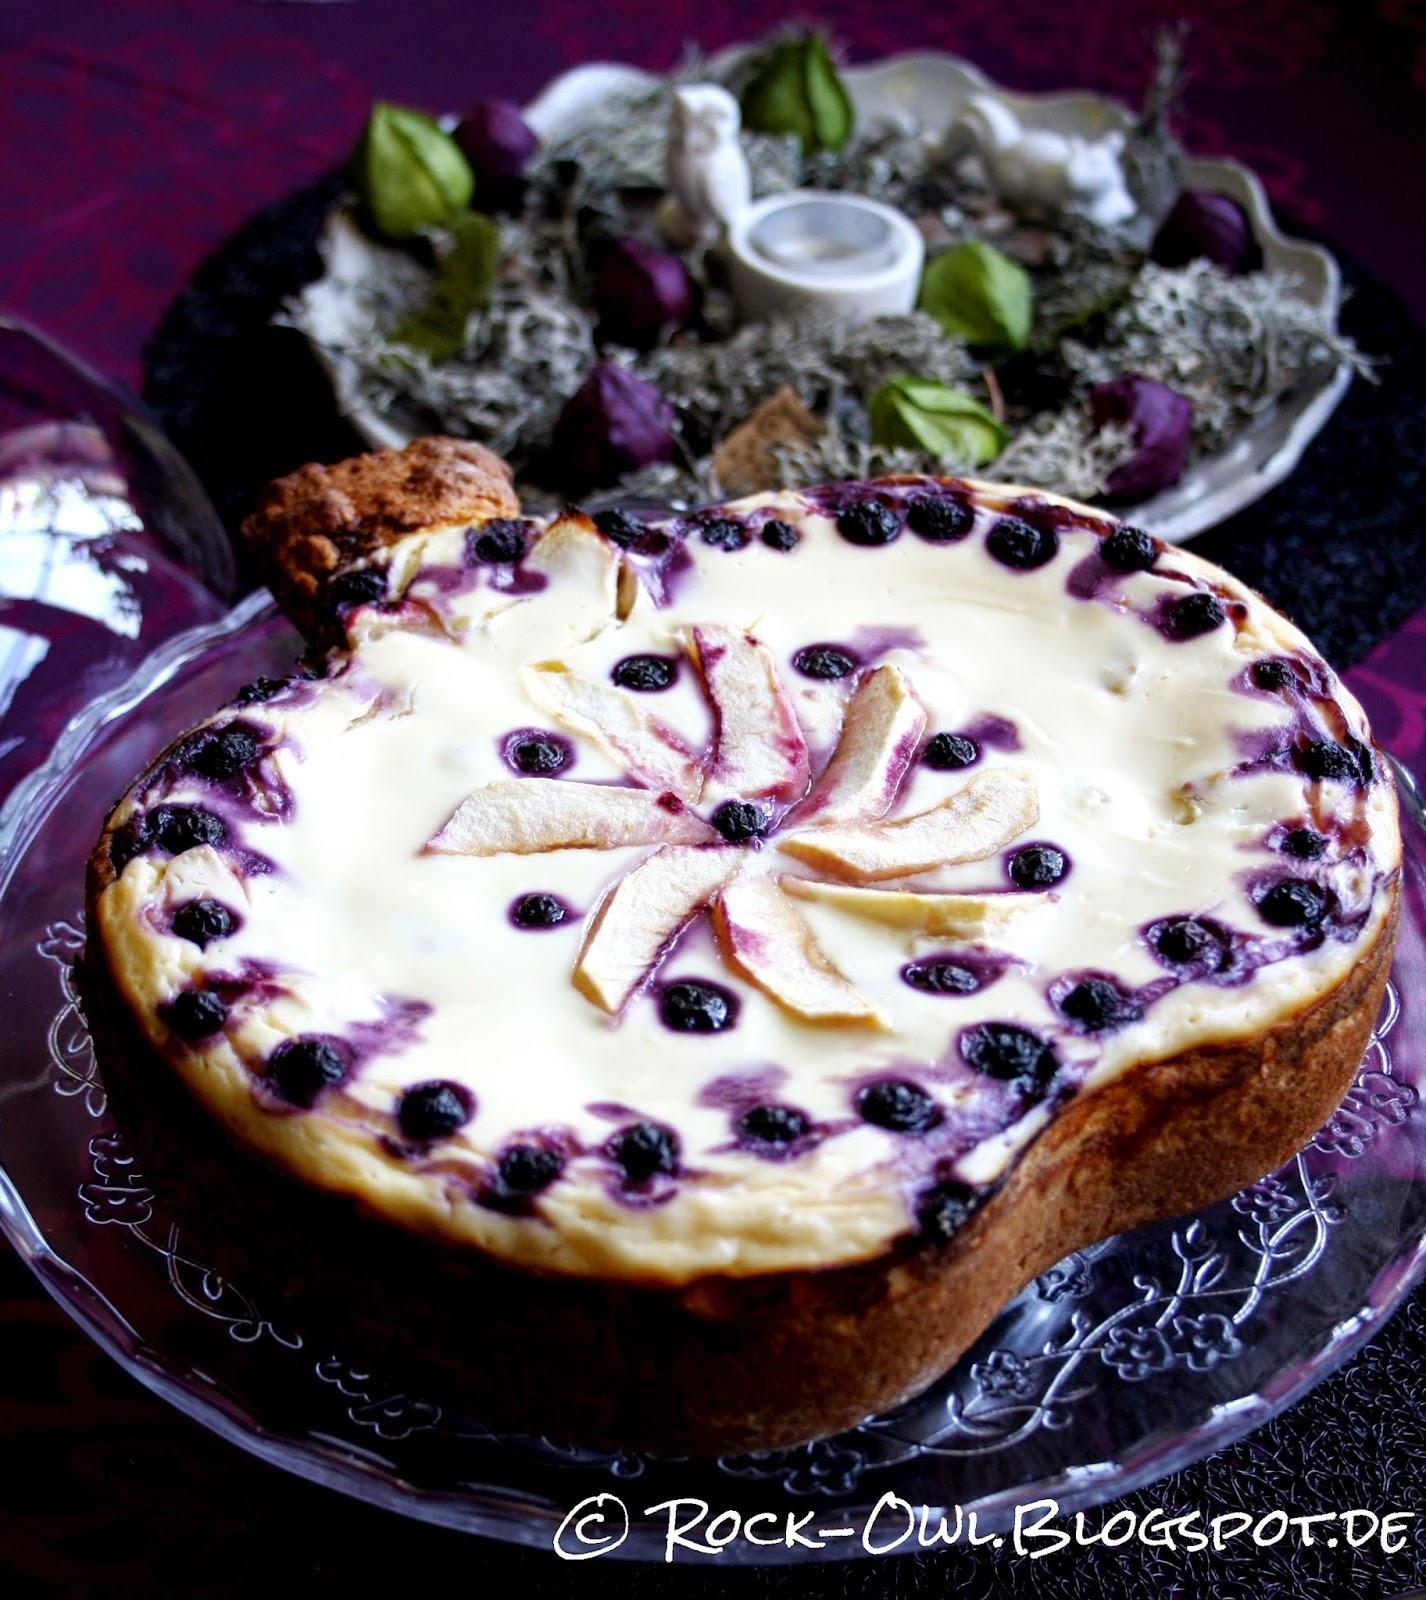 rock and owl blog herbsthaft apfel heidelbeer kuchen mit vanillequark. Black Bedroom Furniture Sets. Home Design Ideas